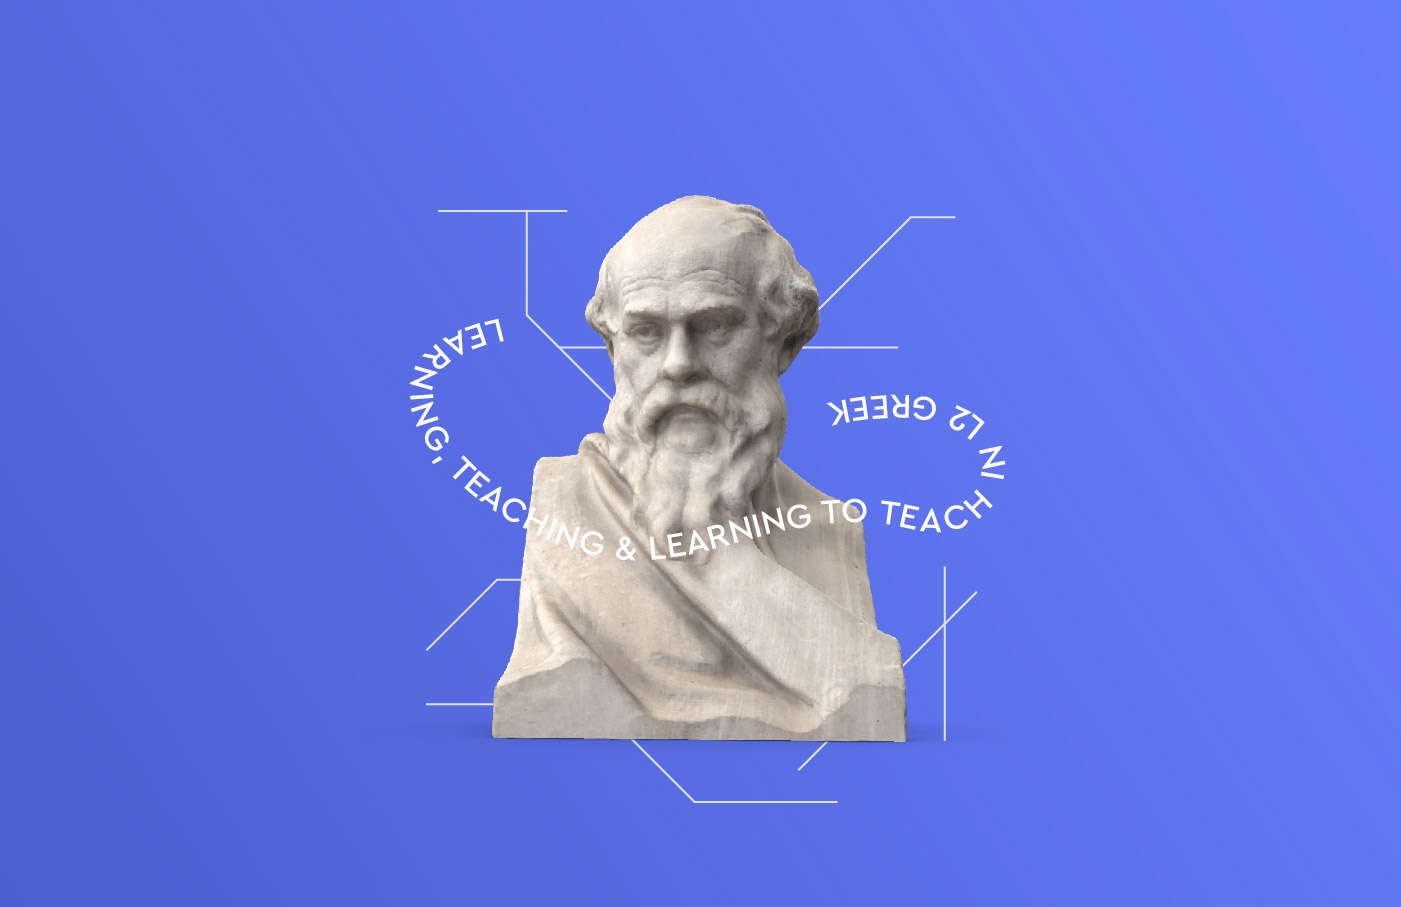 learning teaching greek research university logo design branding lines azure blue